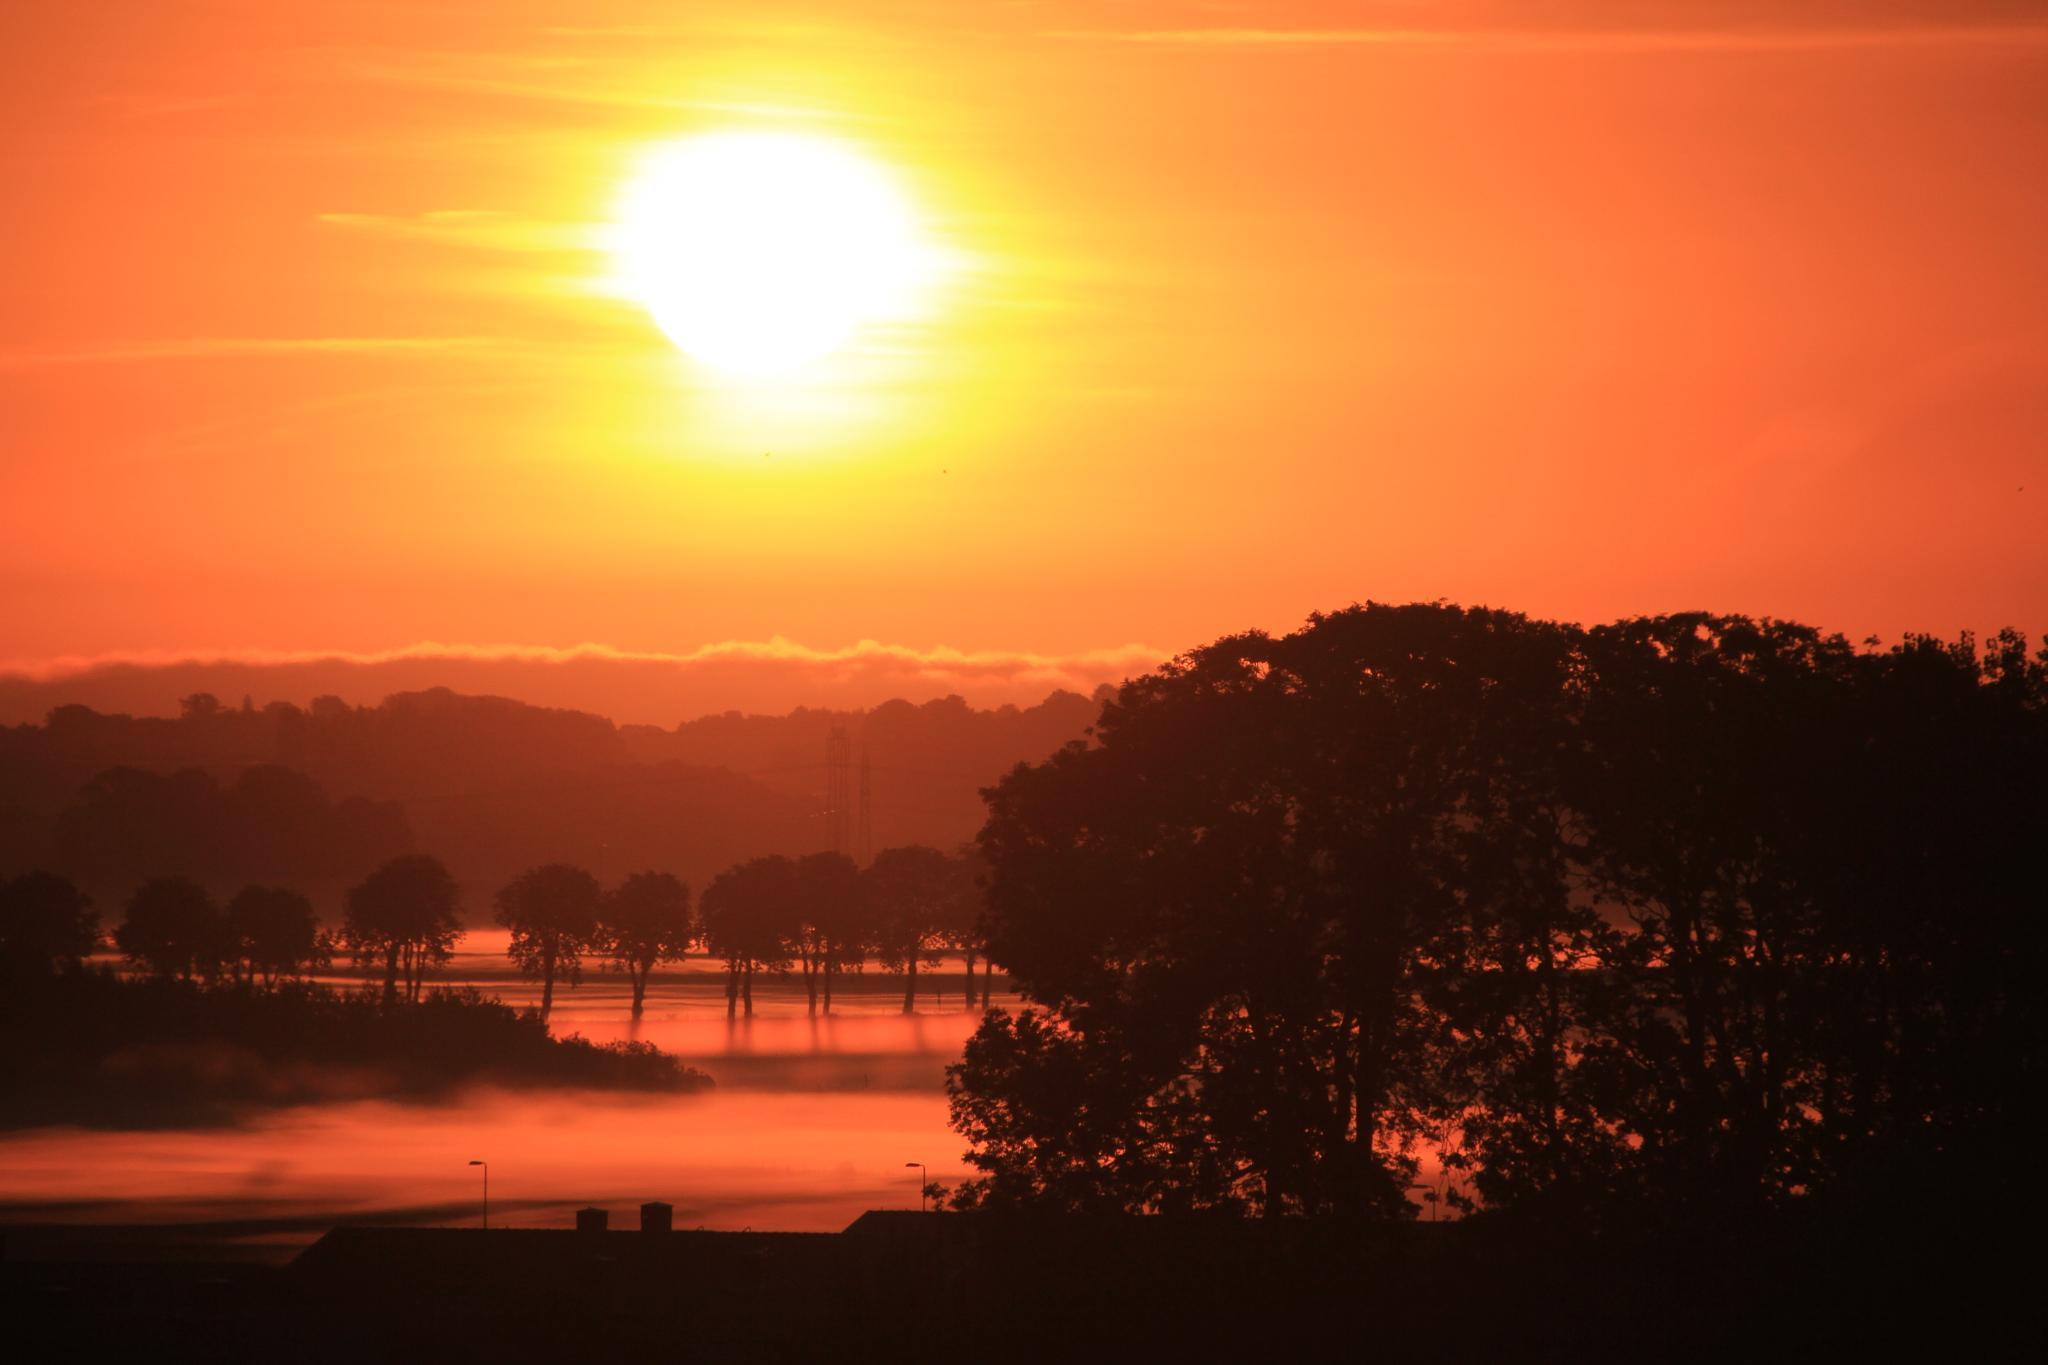 Sunrise in august by yasmine.feldtblad